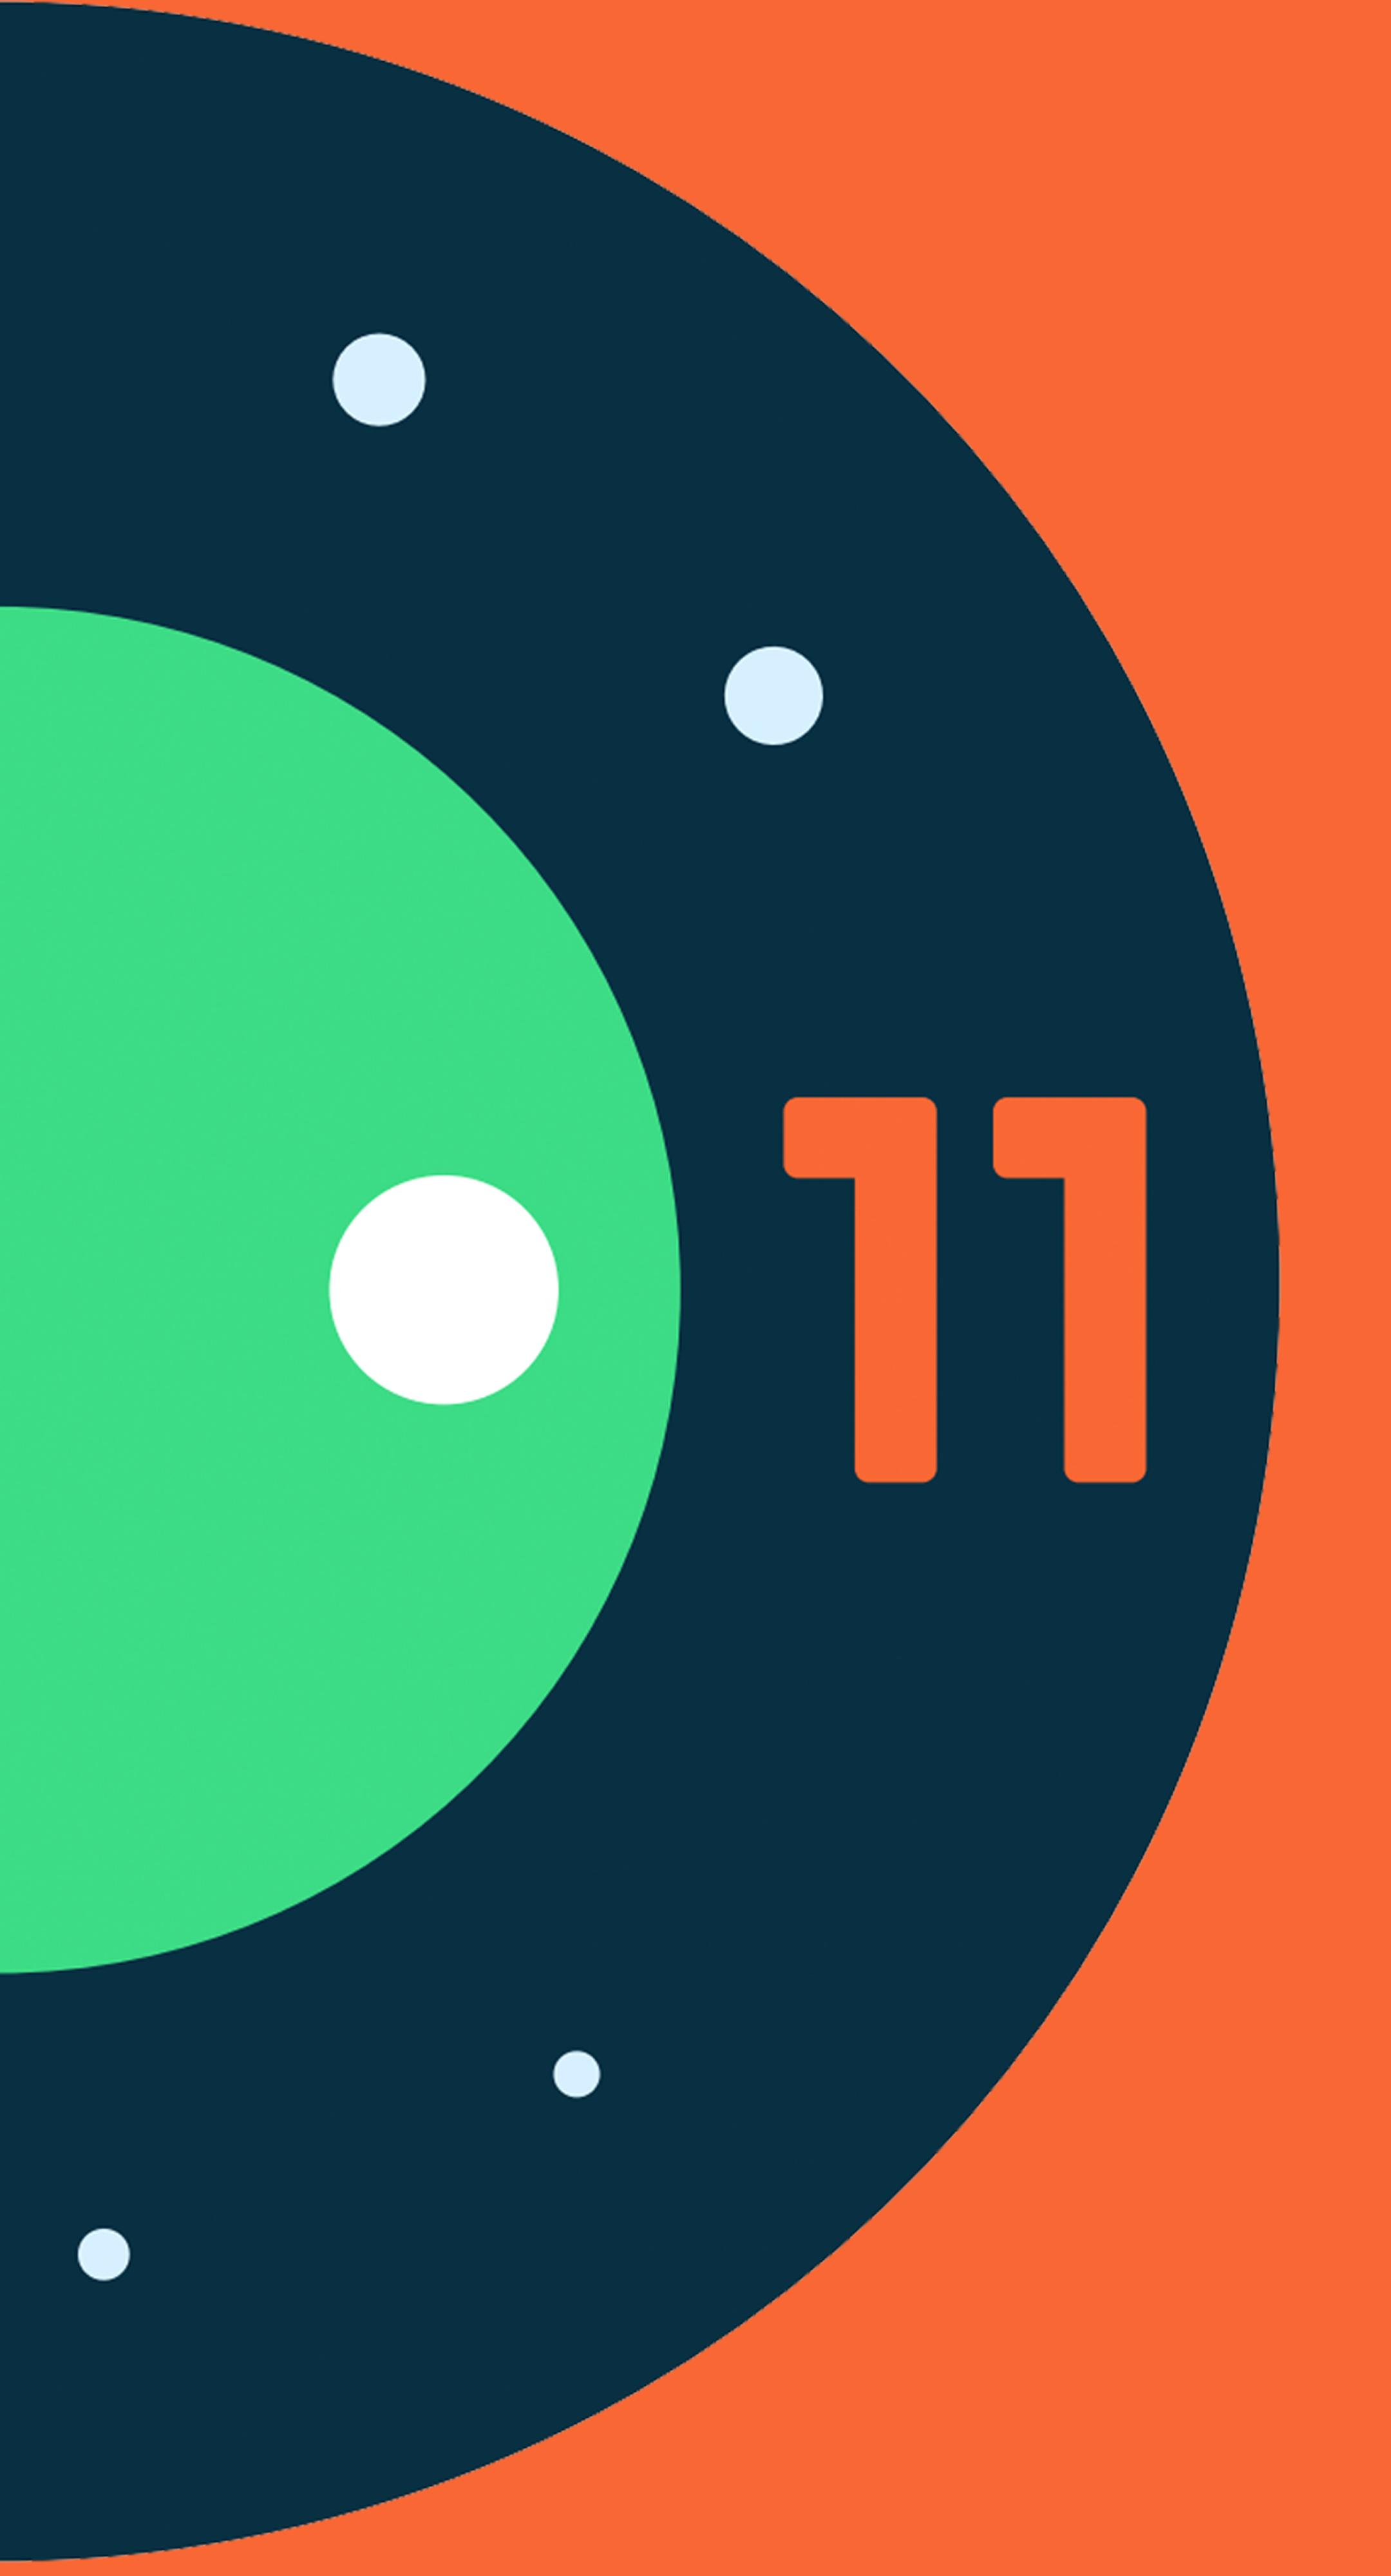 android-11-logo-orange.png